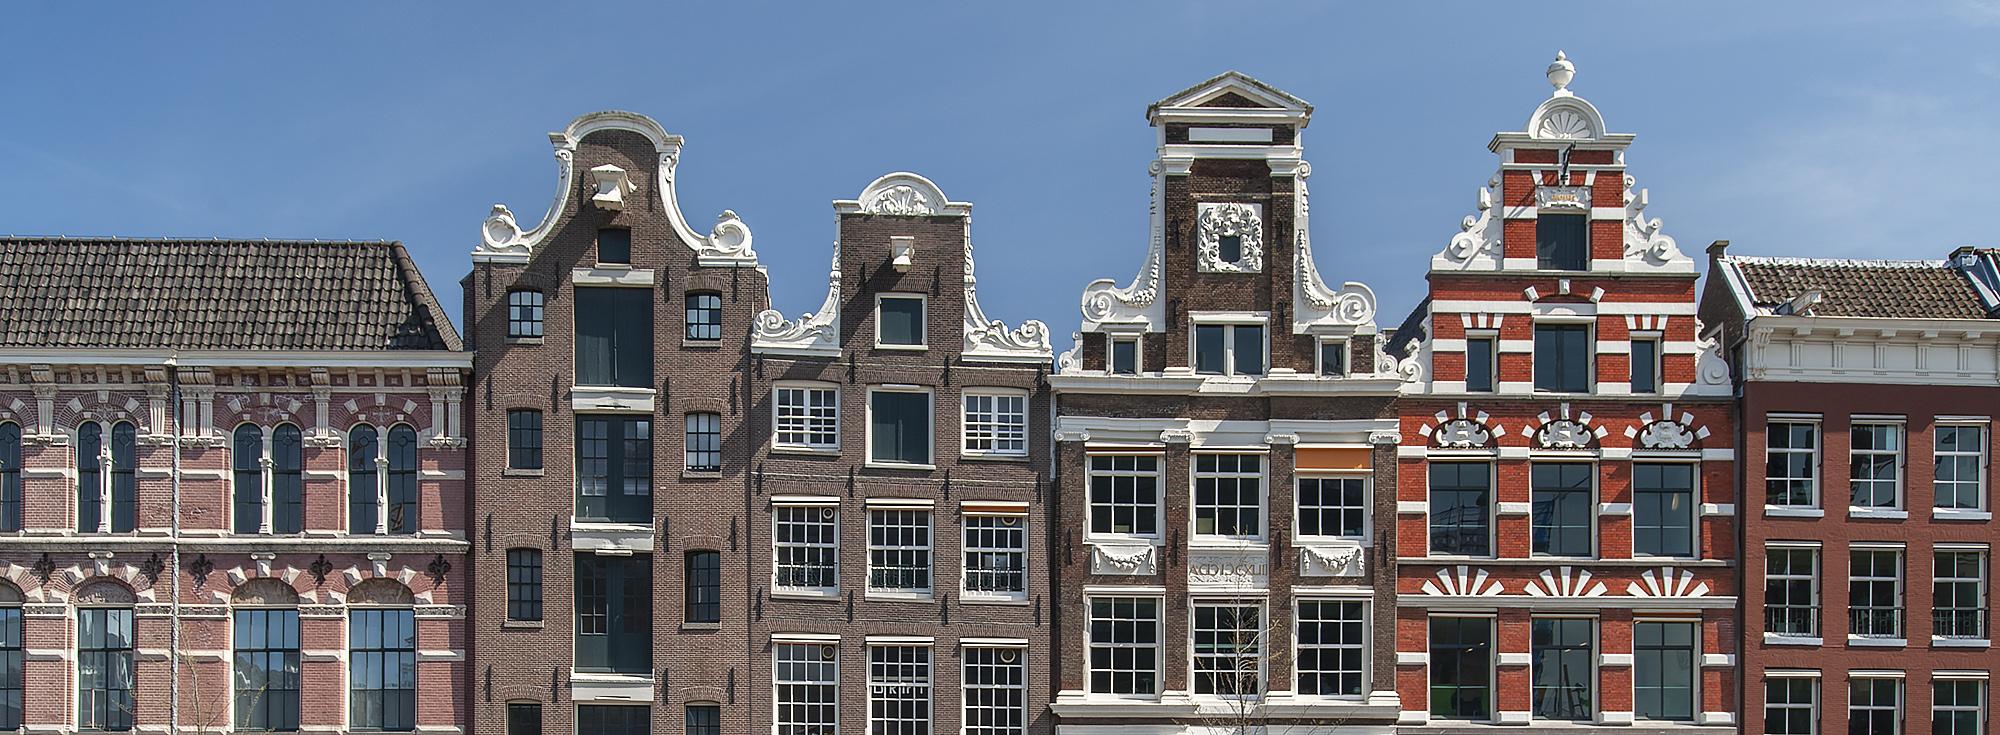 Gevels grachtenpanden Amsterdam | Monumentenfotogrraaf Leontine van Geffen- Lamers